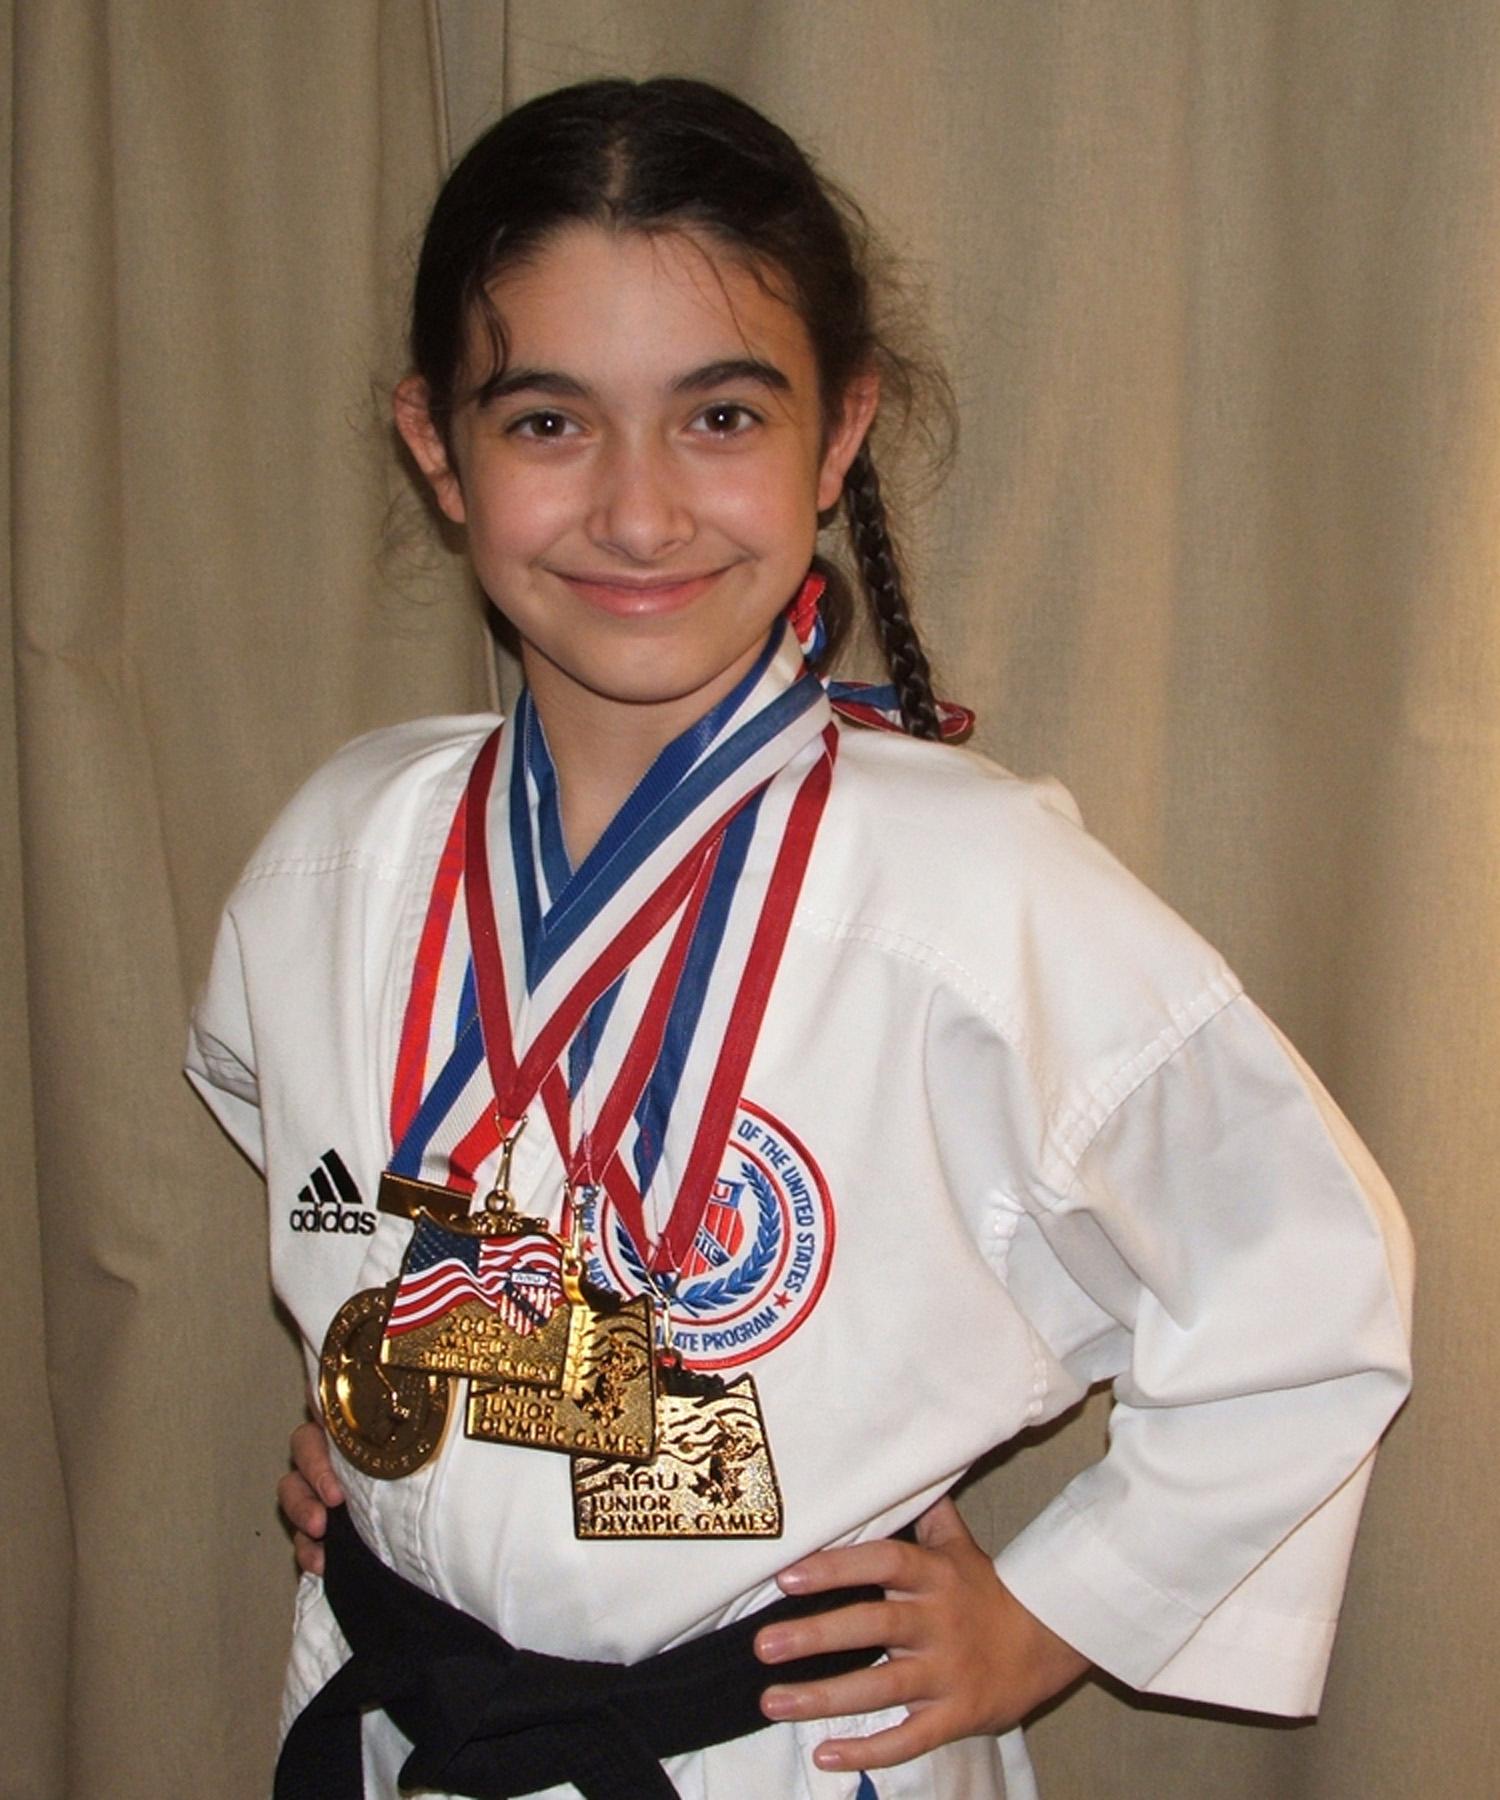 2005_champion.jpg